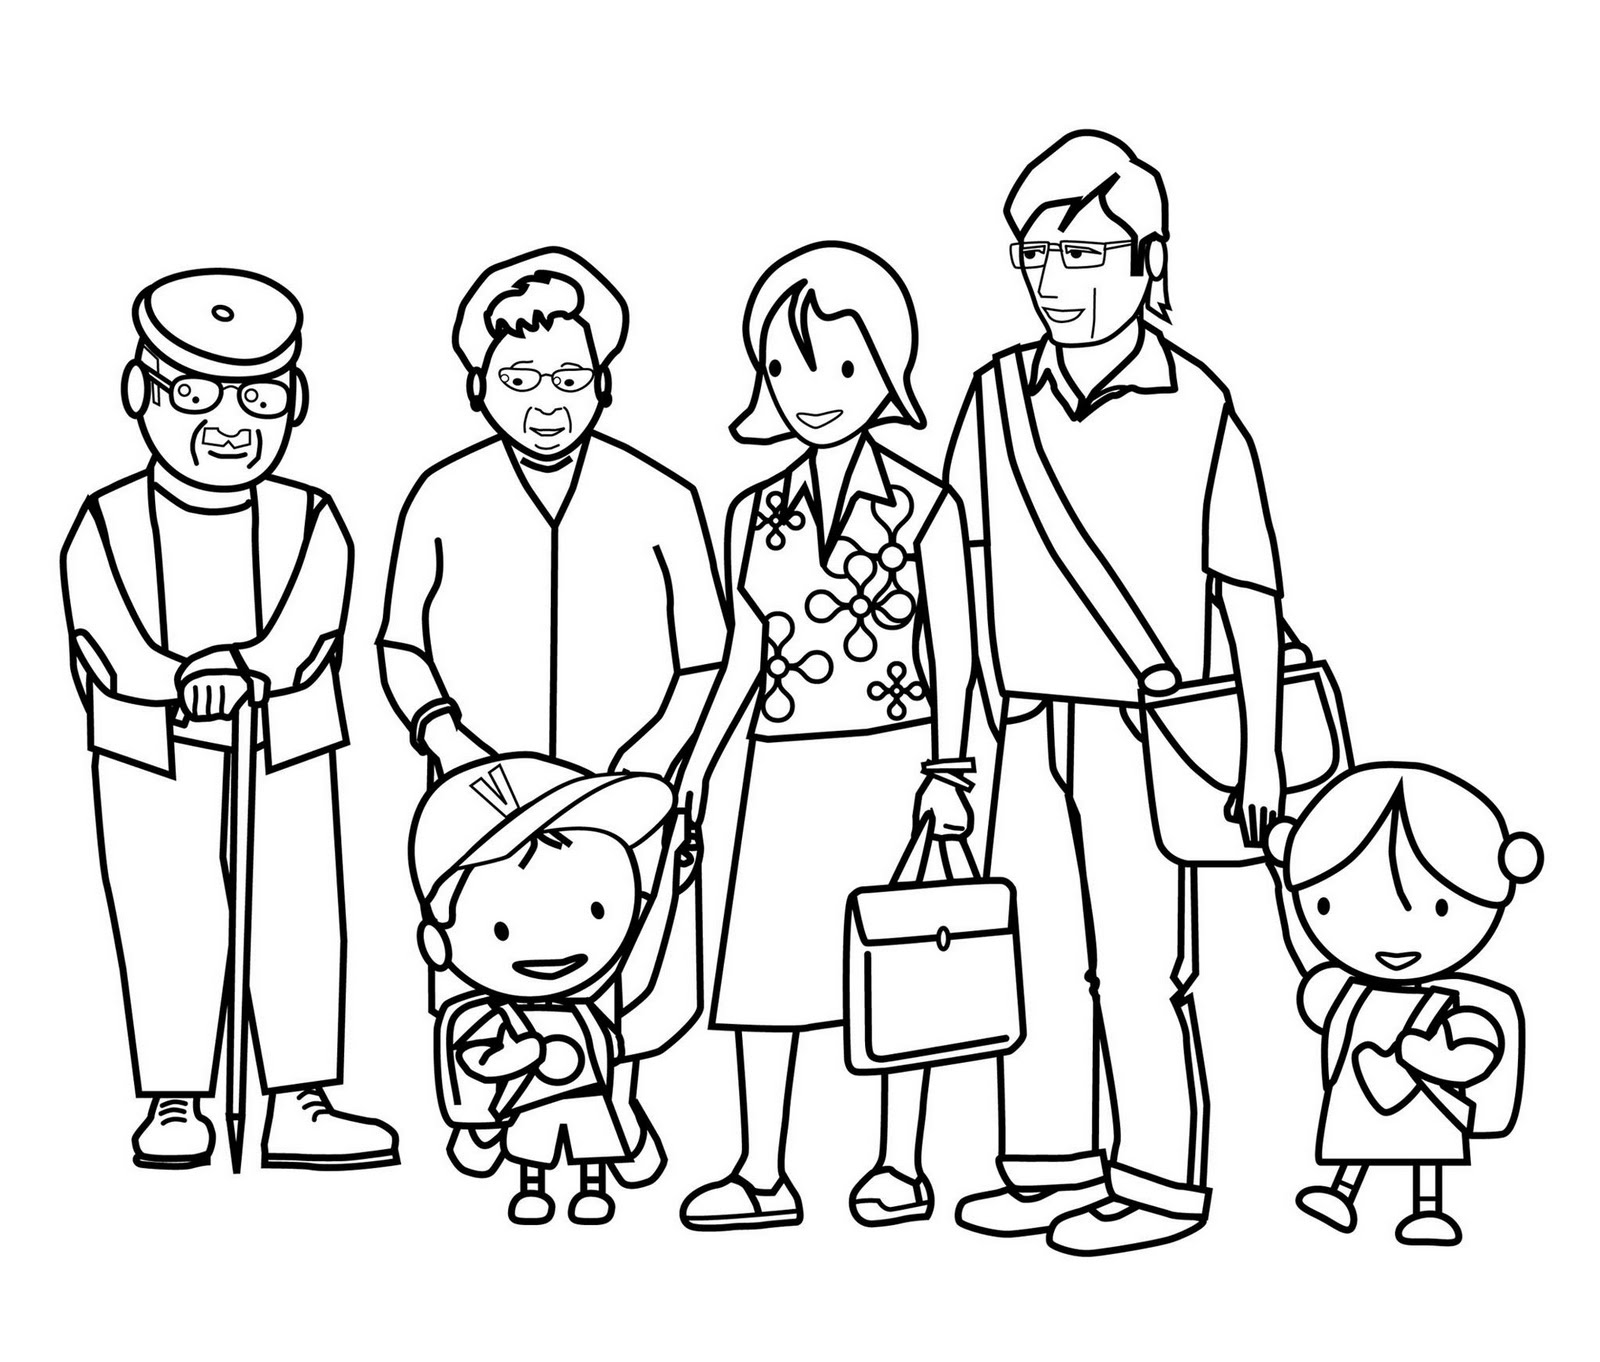 Familia Extensa Dibujo Para Colorear - Get Yasabe